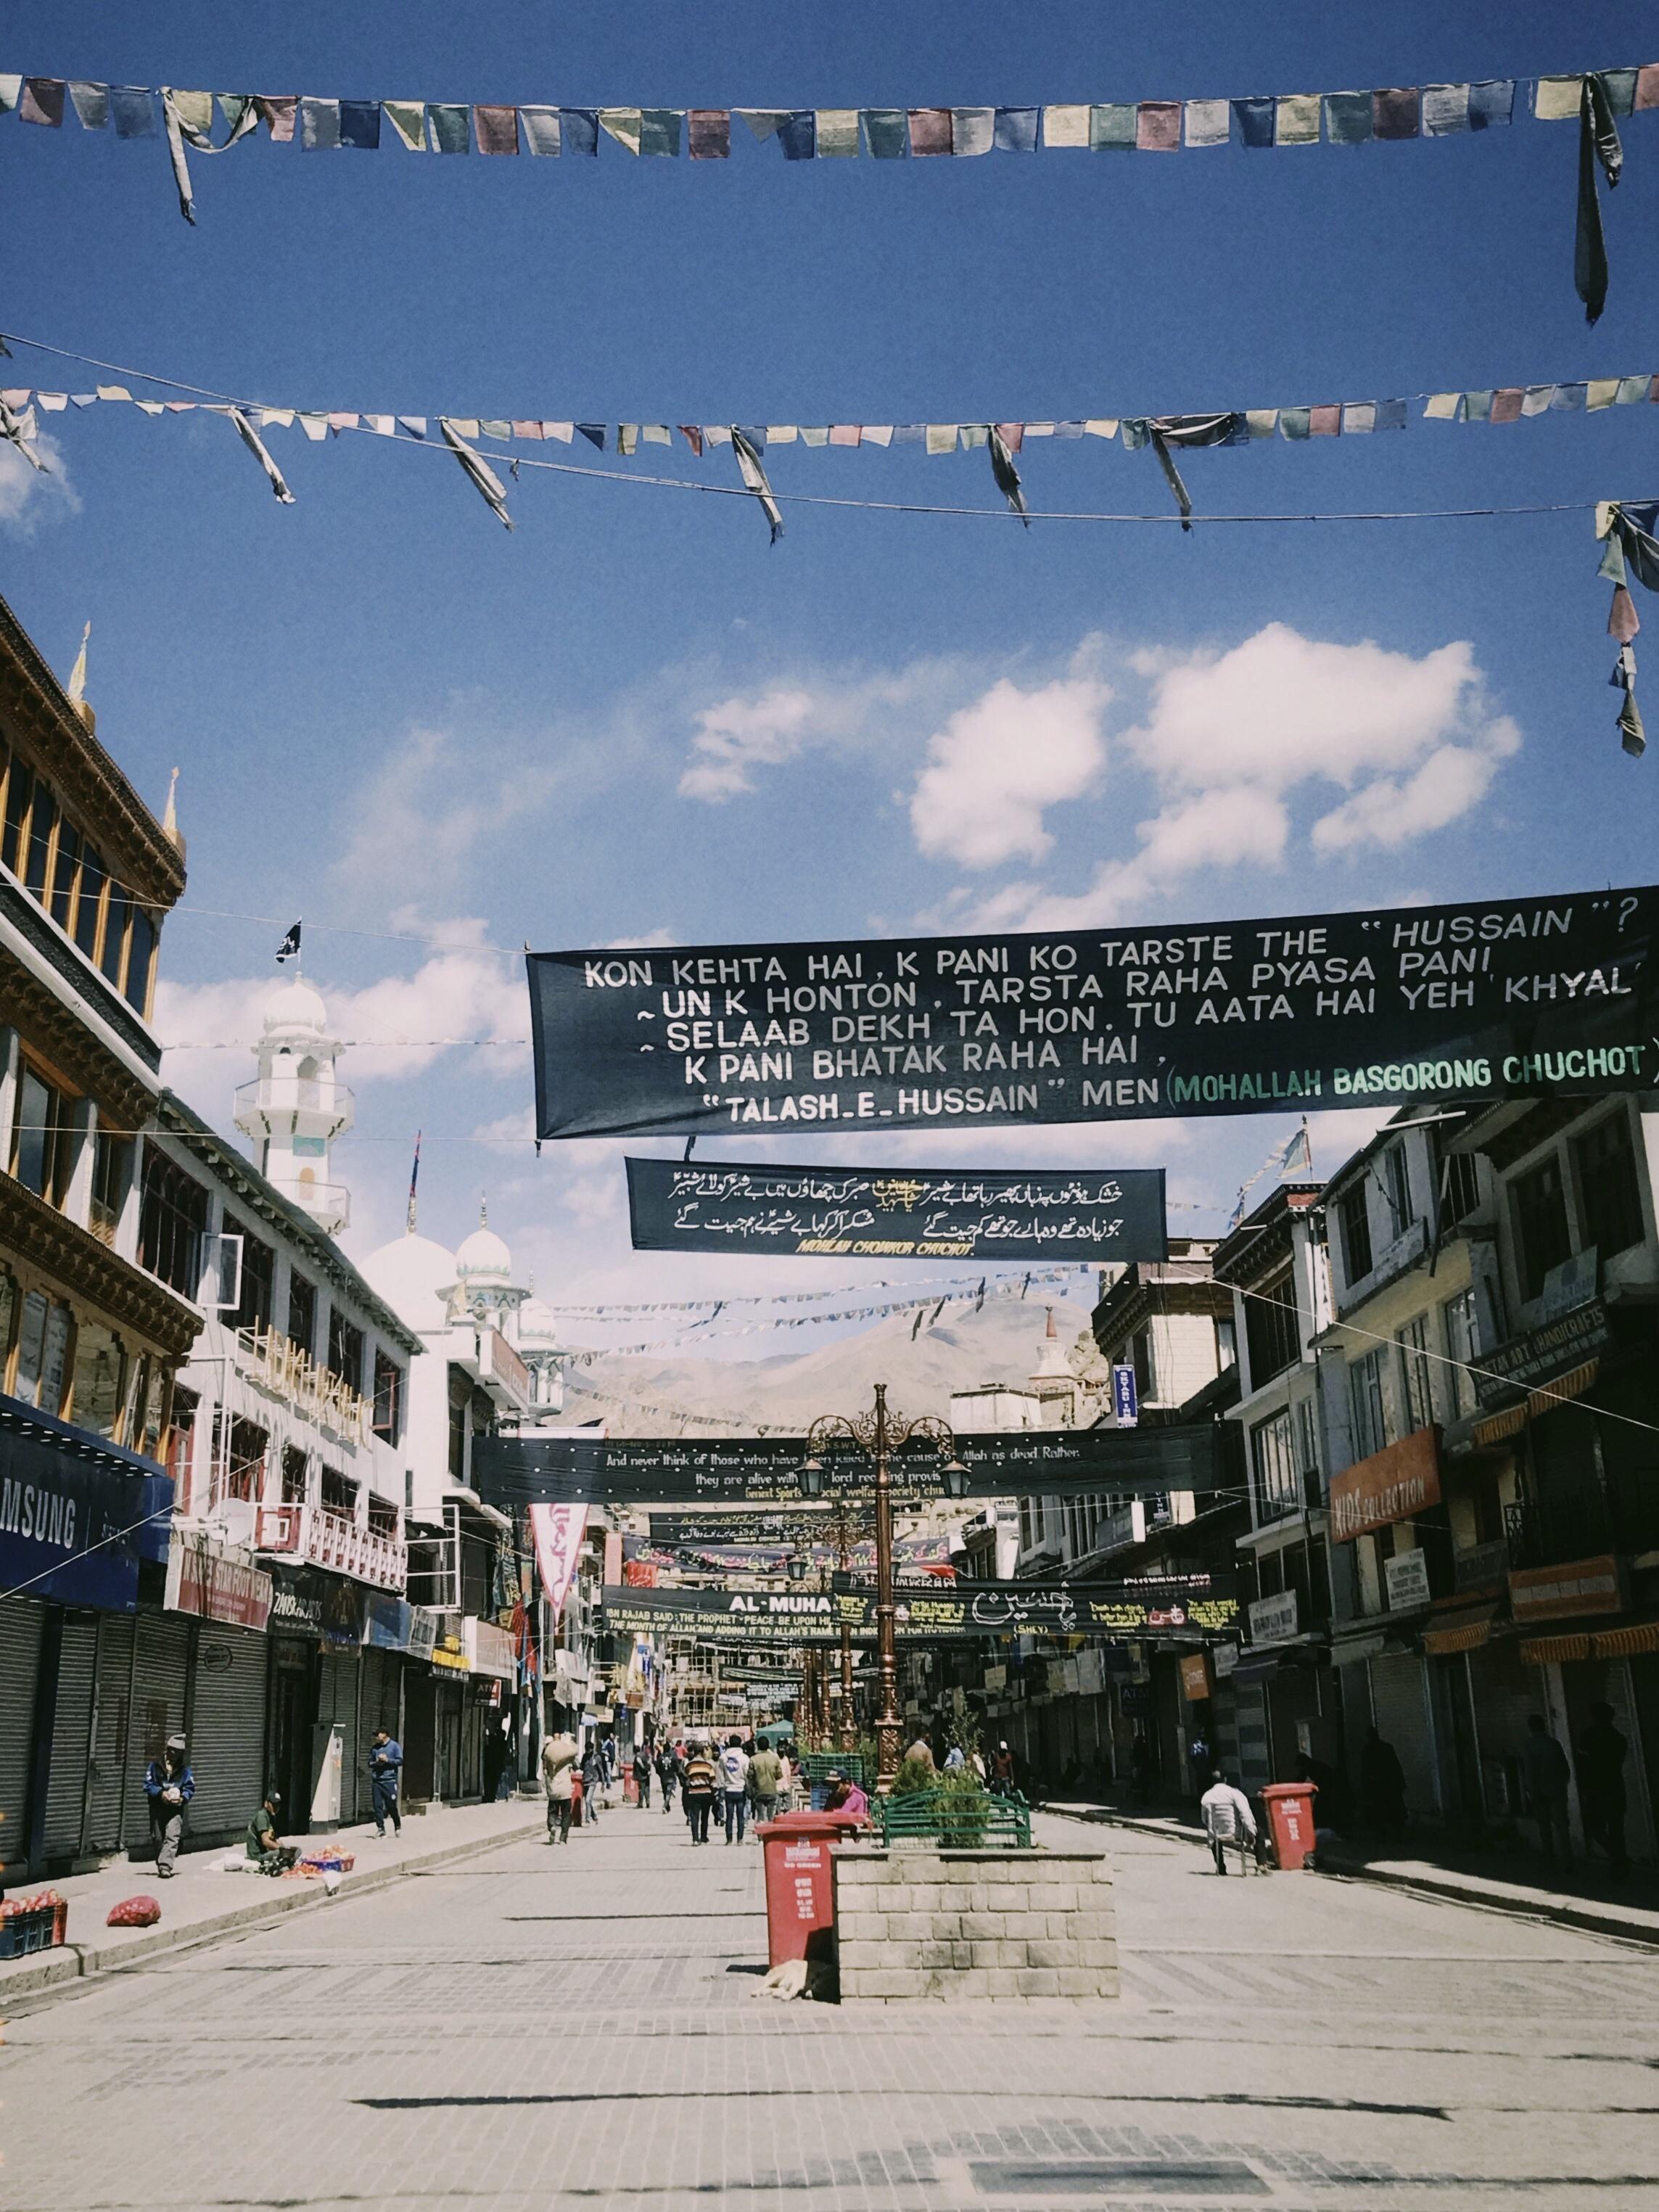 Duong den Ladakh - hanh trinh danh cho nhung doi chan khong biet moi hinh anh 34